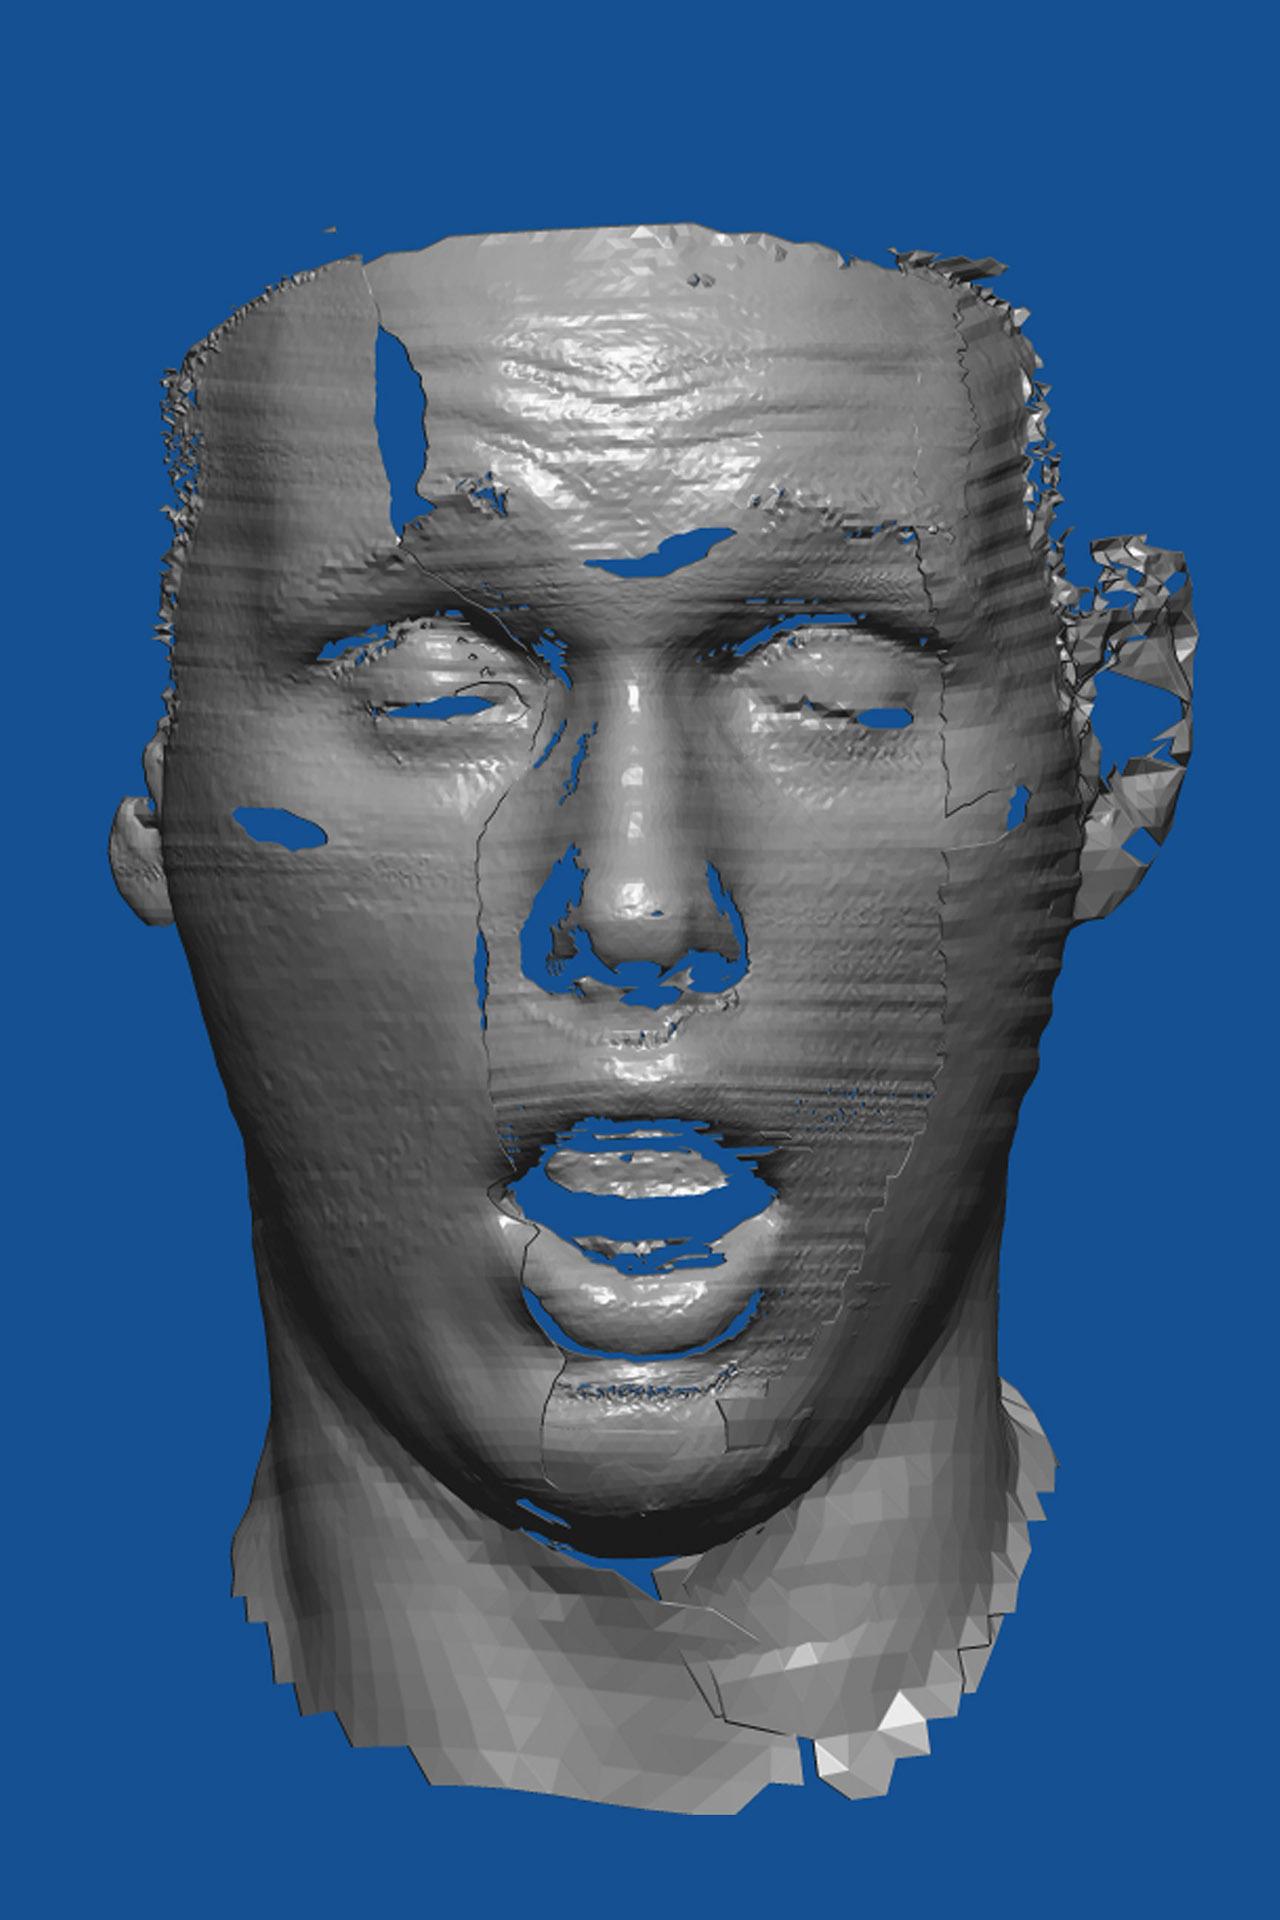 Ian-Nakamoto-PMP-3d-scan-moe-shock-s